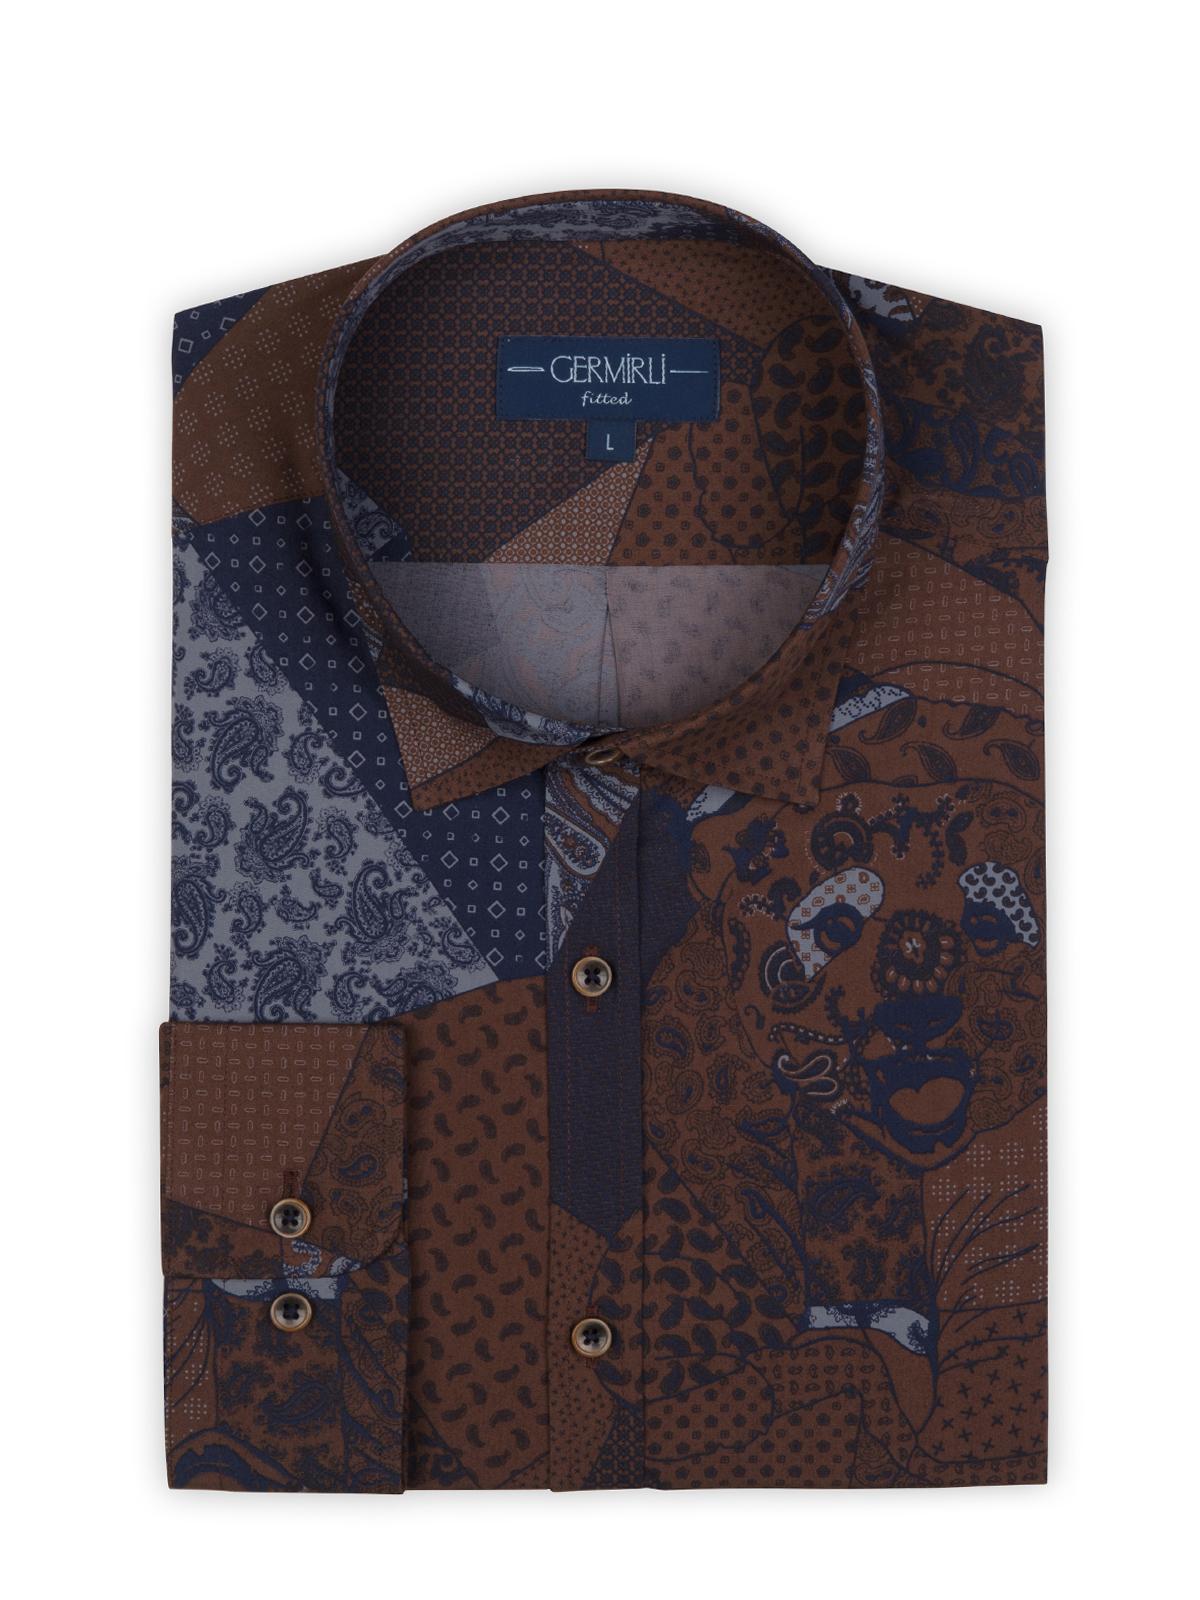 Germirli Kahverengi Lacivert Patchwork Desenli Klasik Yaka Tailor Fit Gömlek